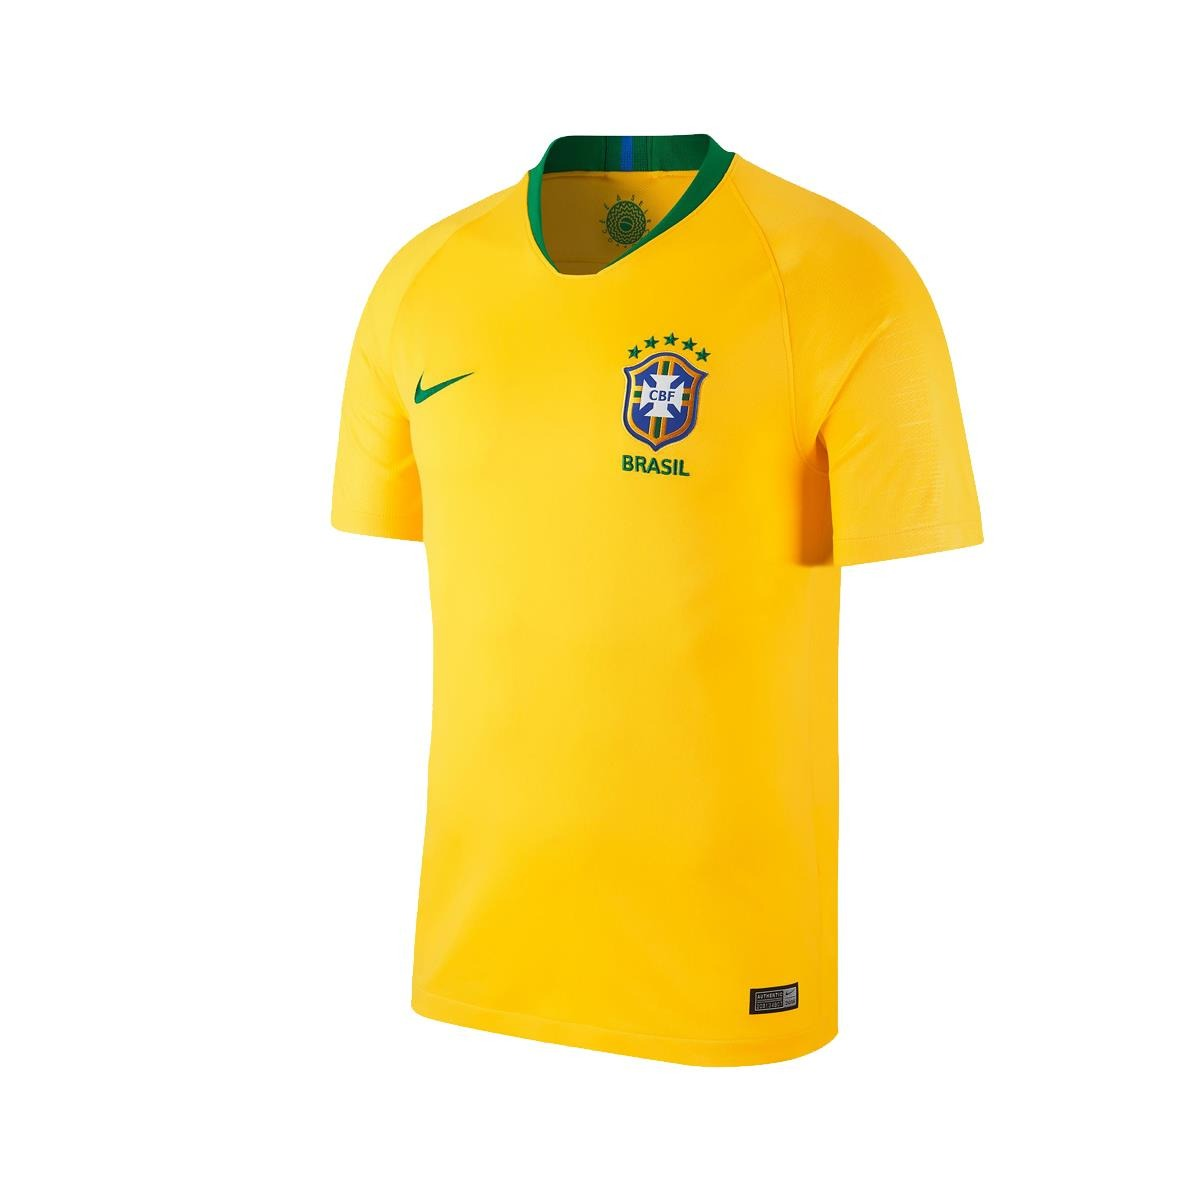 camisa nike brasil 2018 19 torcedor masculina gg. Carregando zoom. 35fd62805bbe9